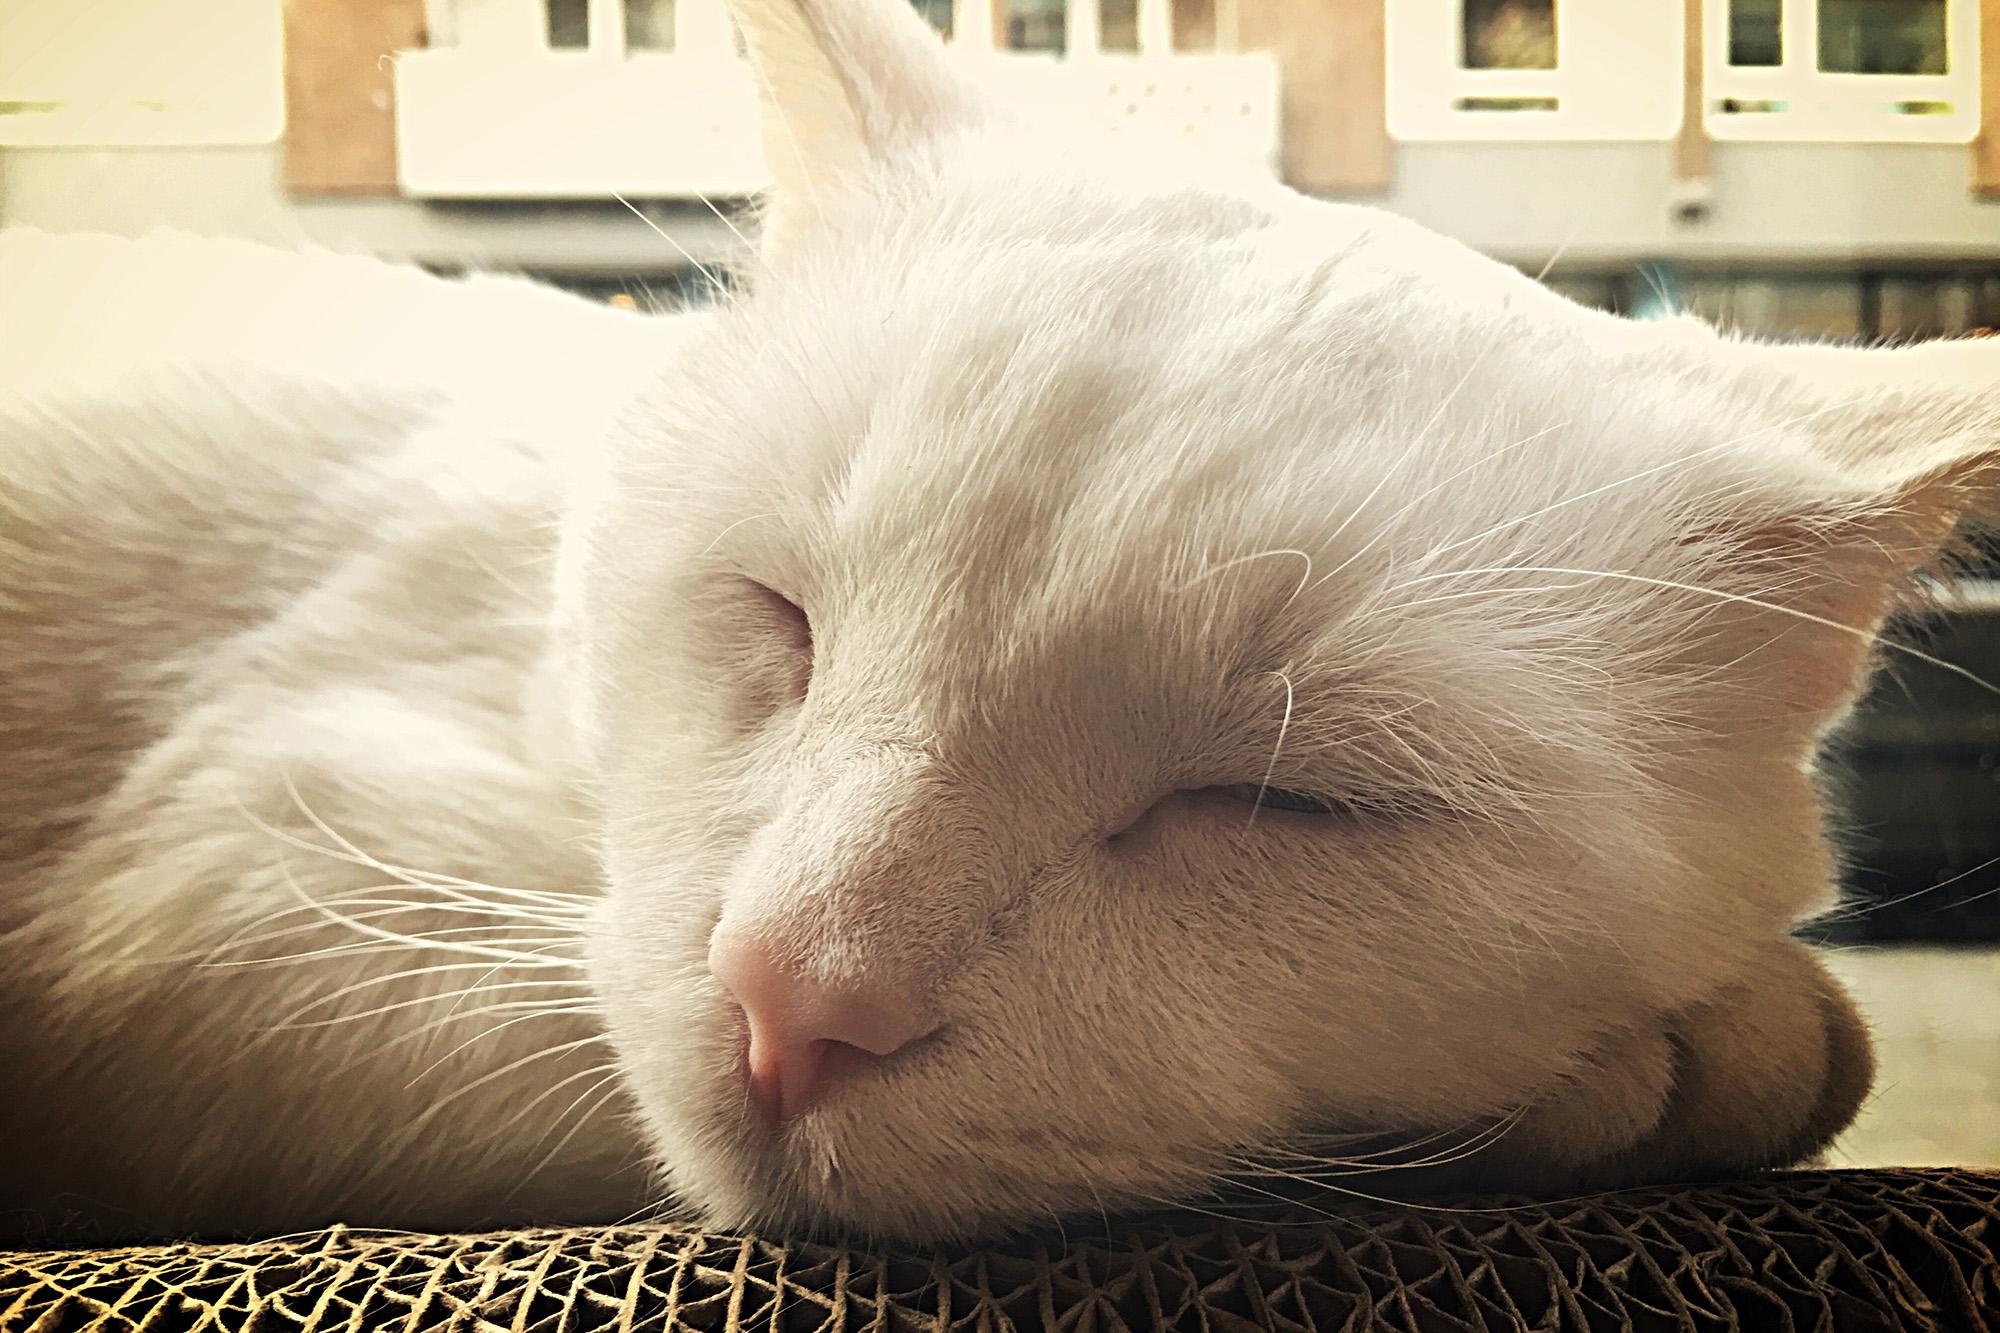 Kattencafe 21